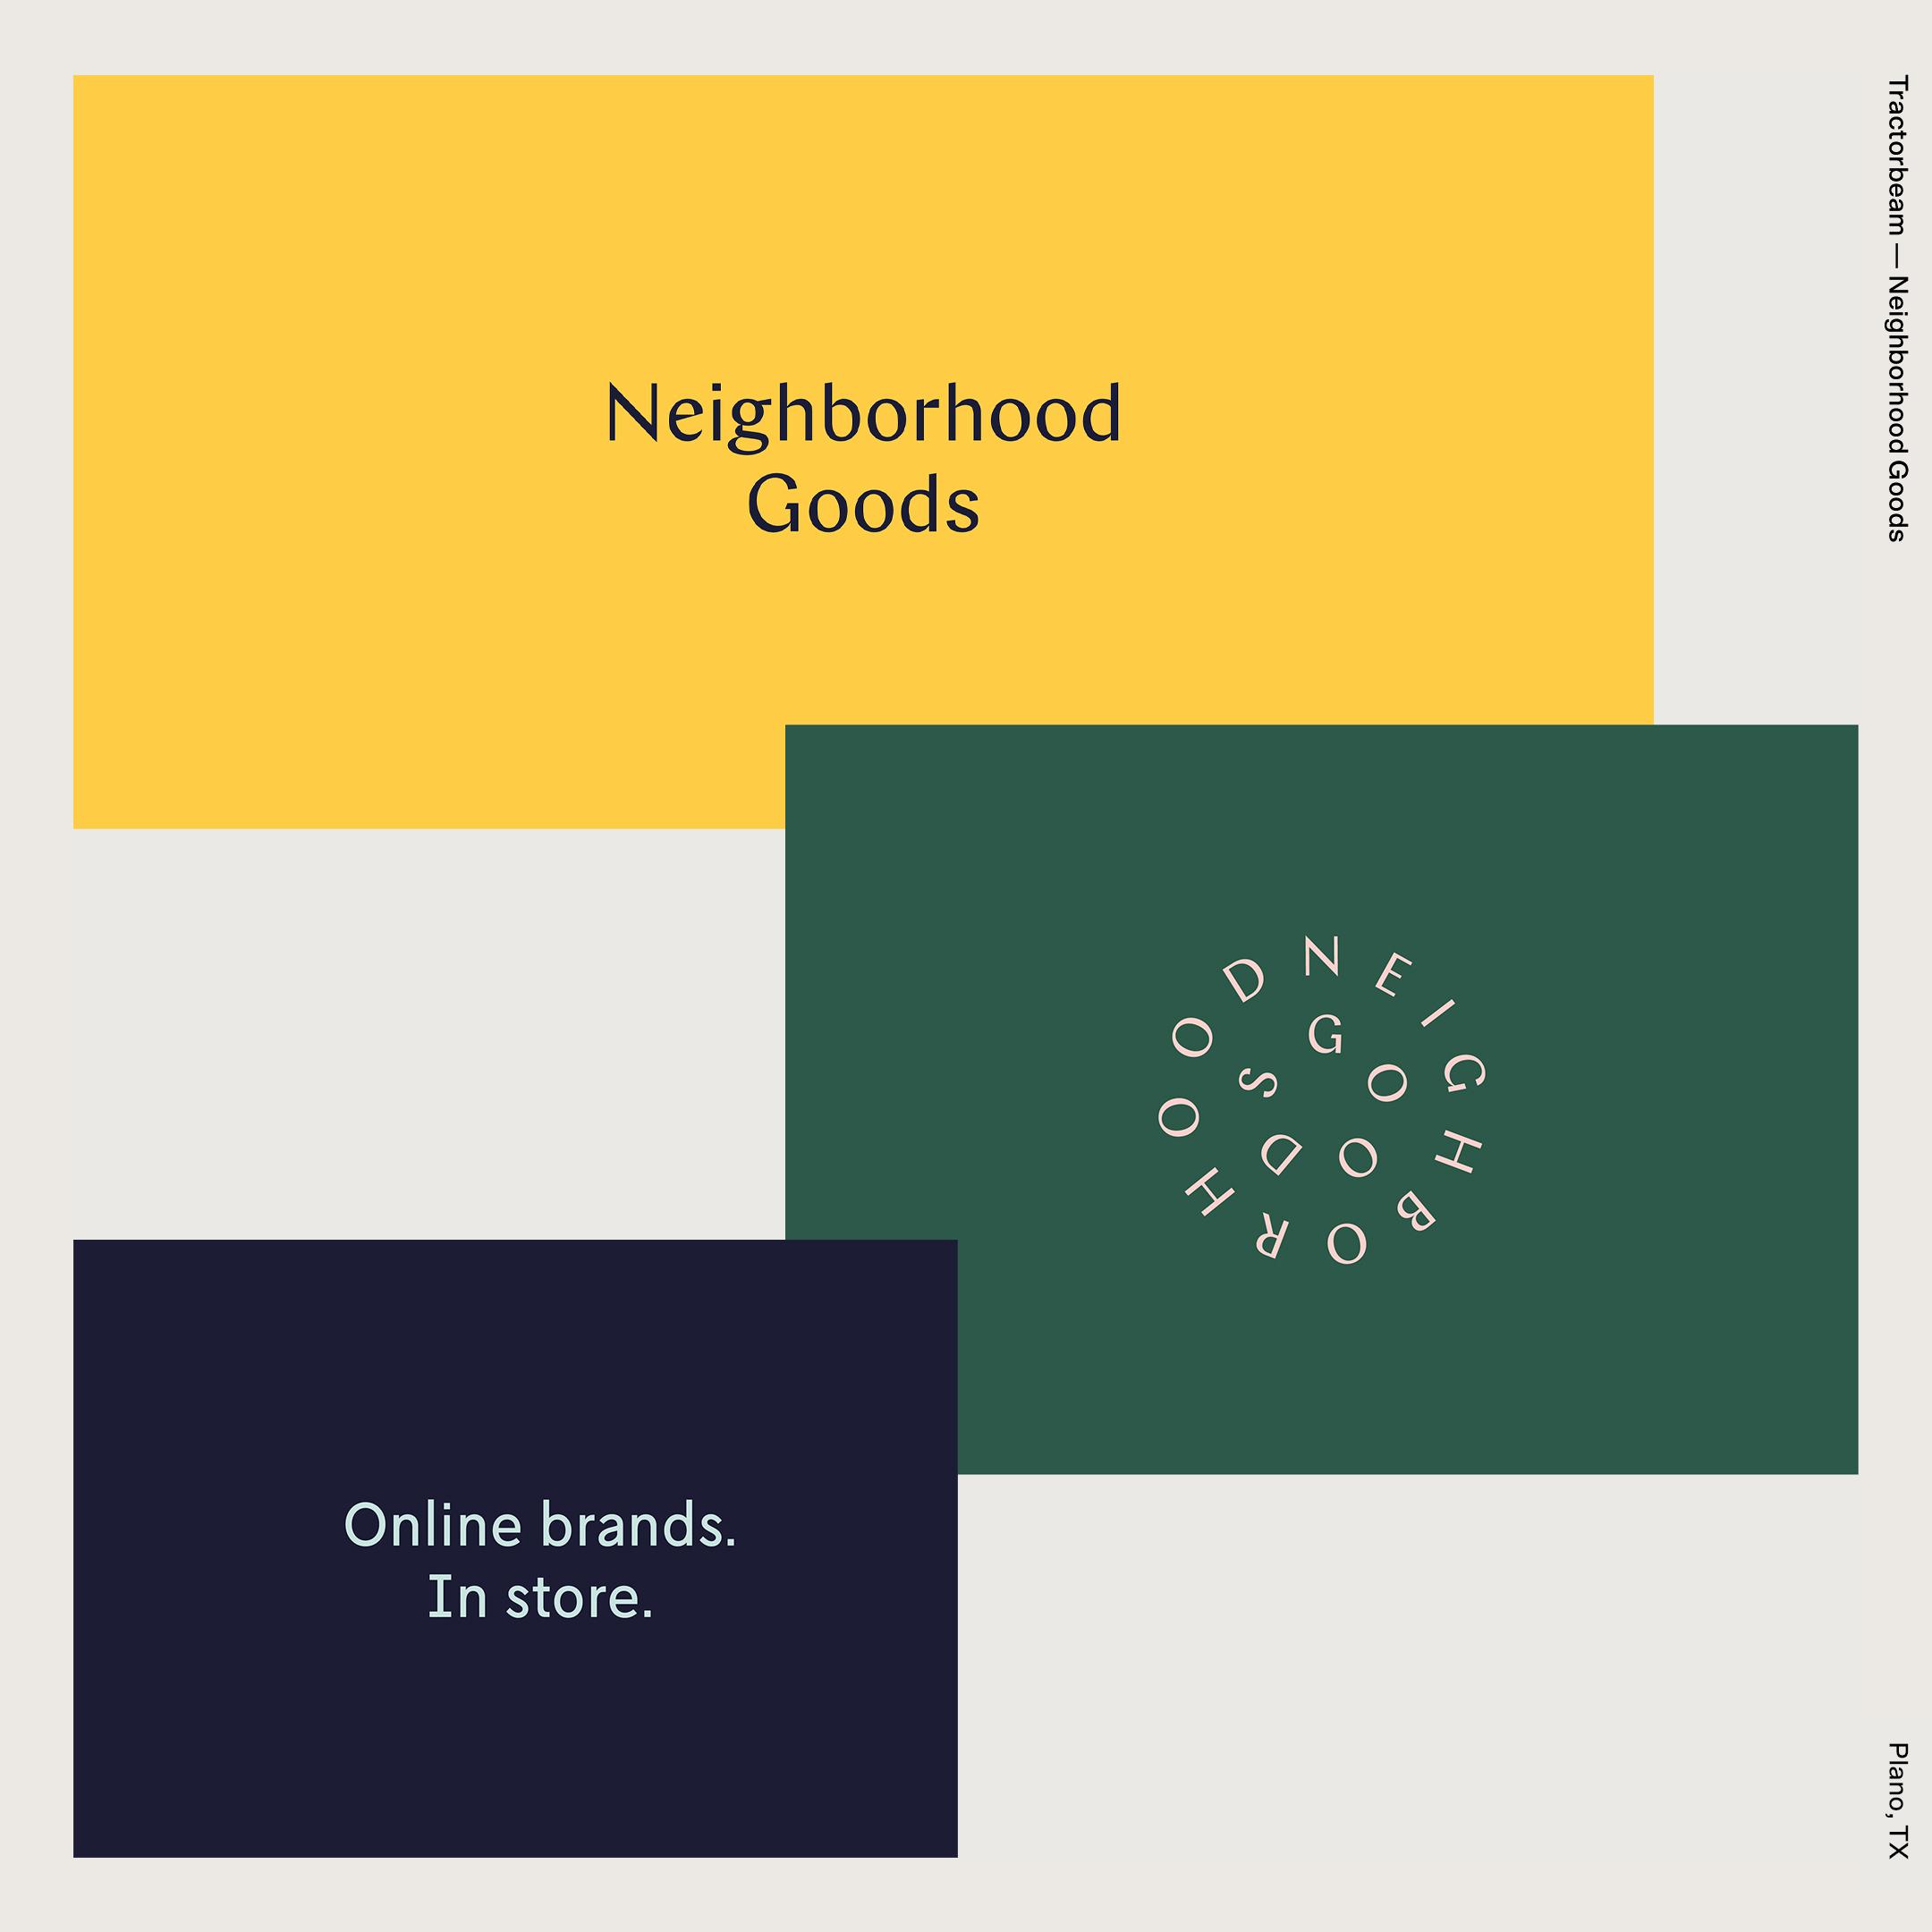 Tractorbeam —Neighborhood Goods